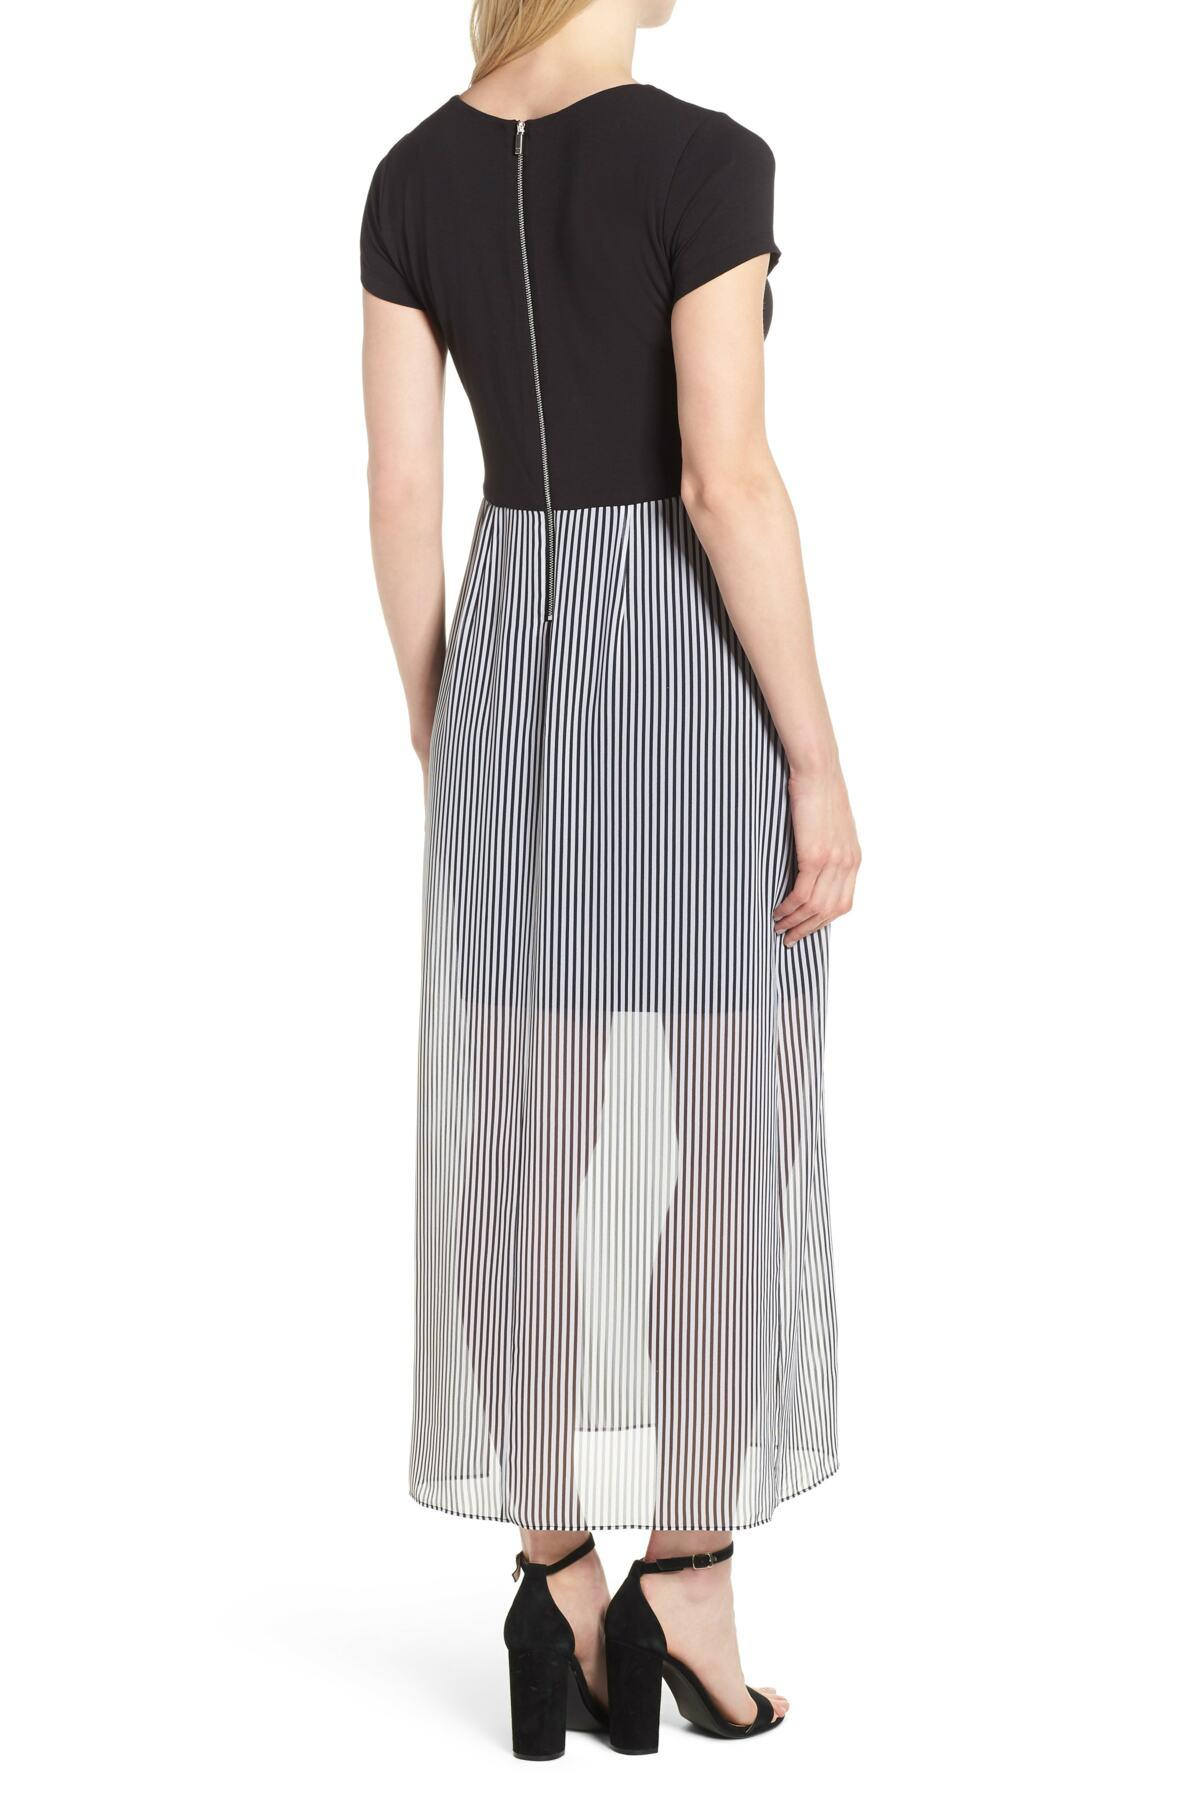 bfbcf462e02 Vince Camuto - Black Stripe Chiffon Overlay Maxi Dress - Lyst. View  fullscreen